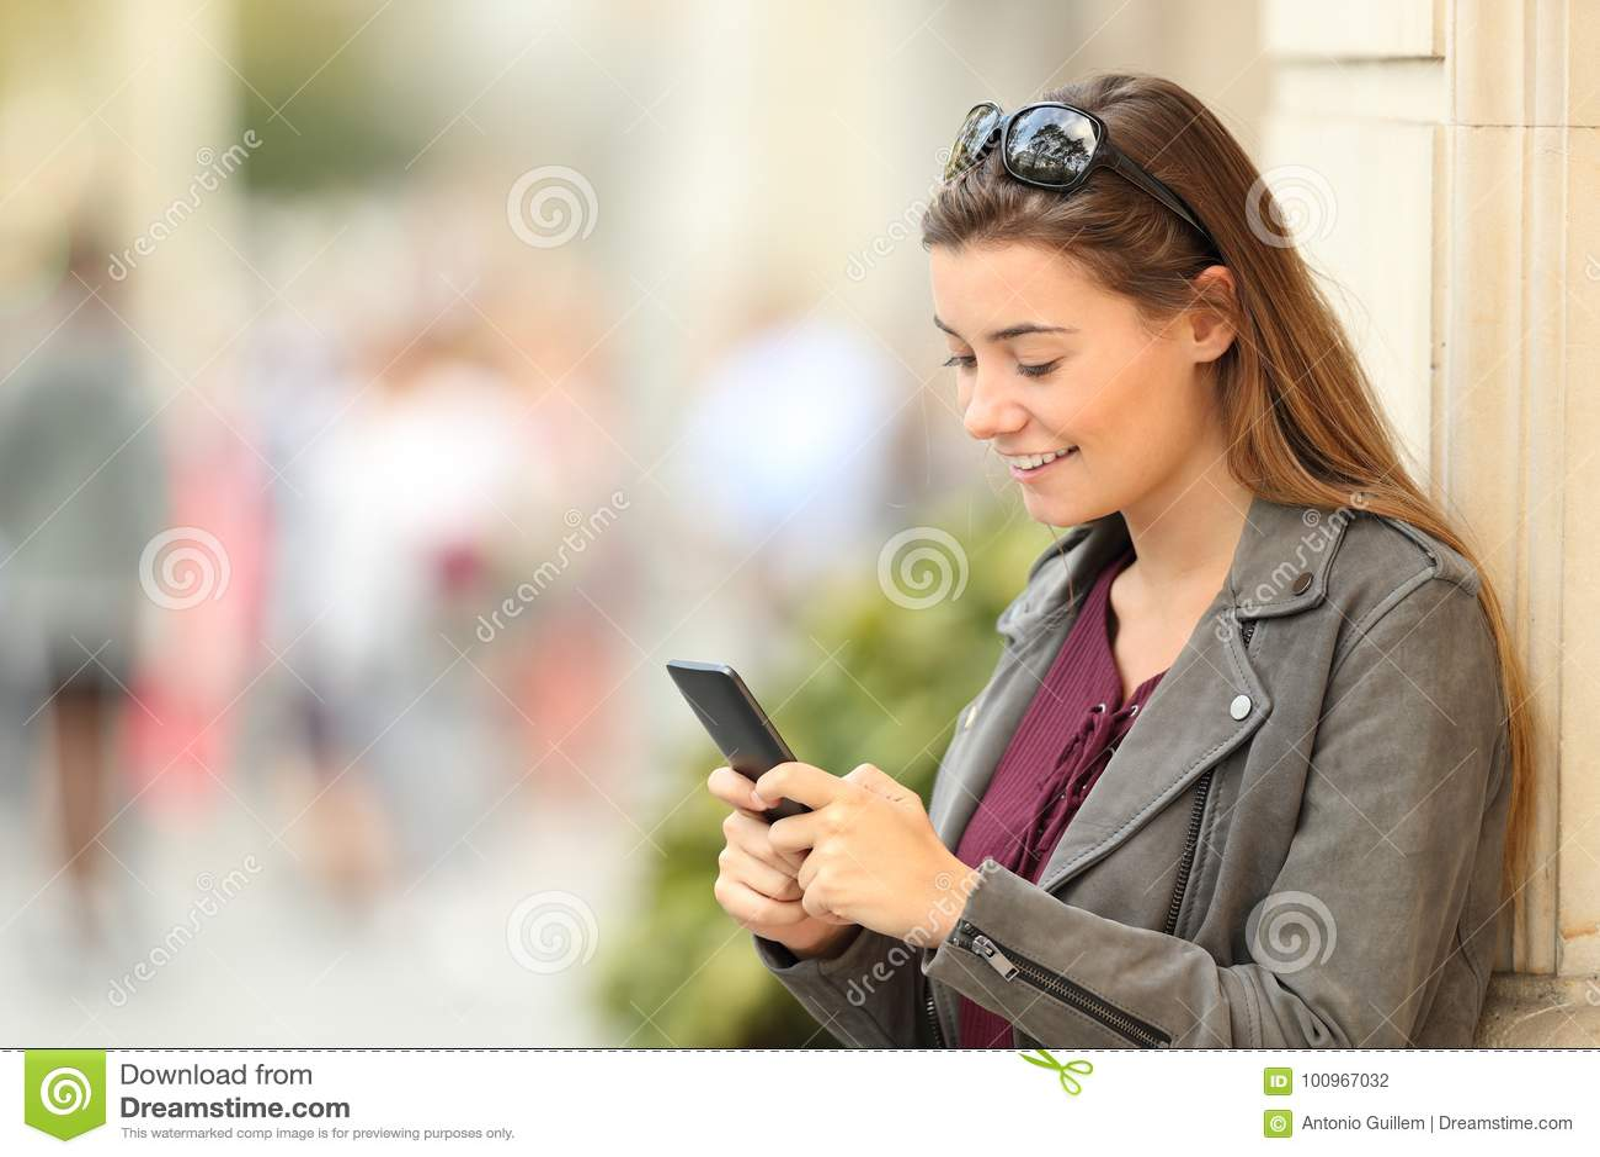 single girl mobile number